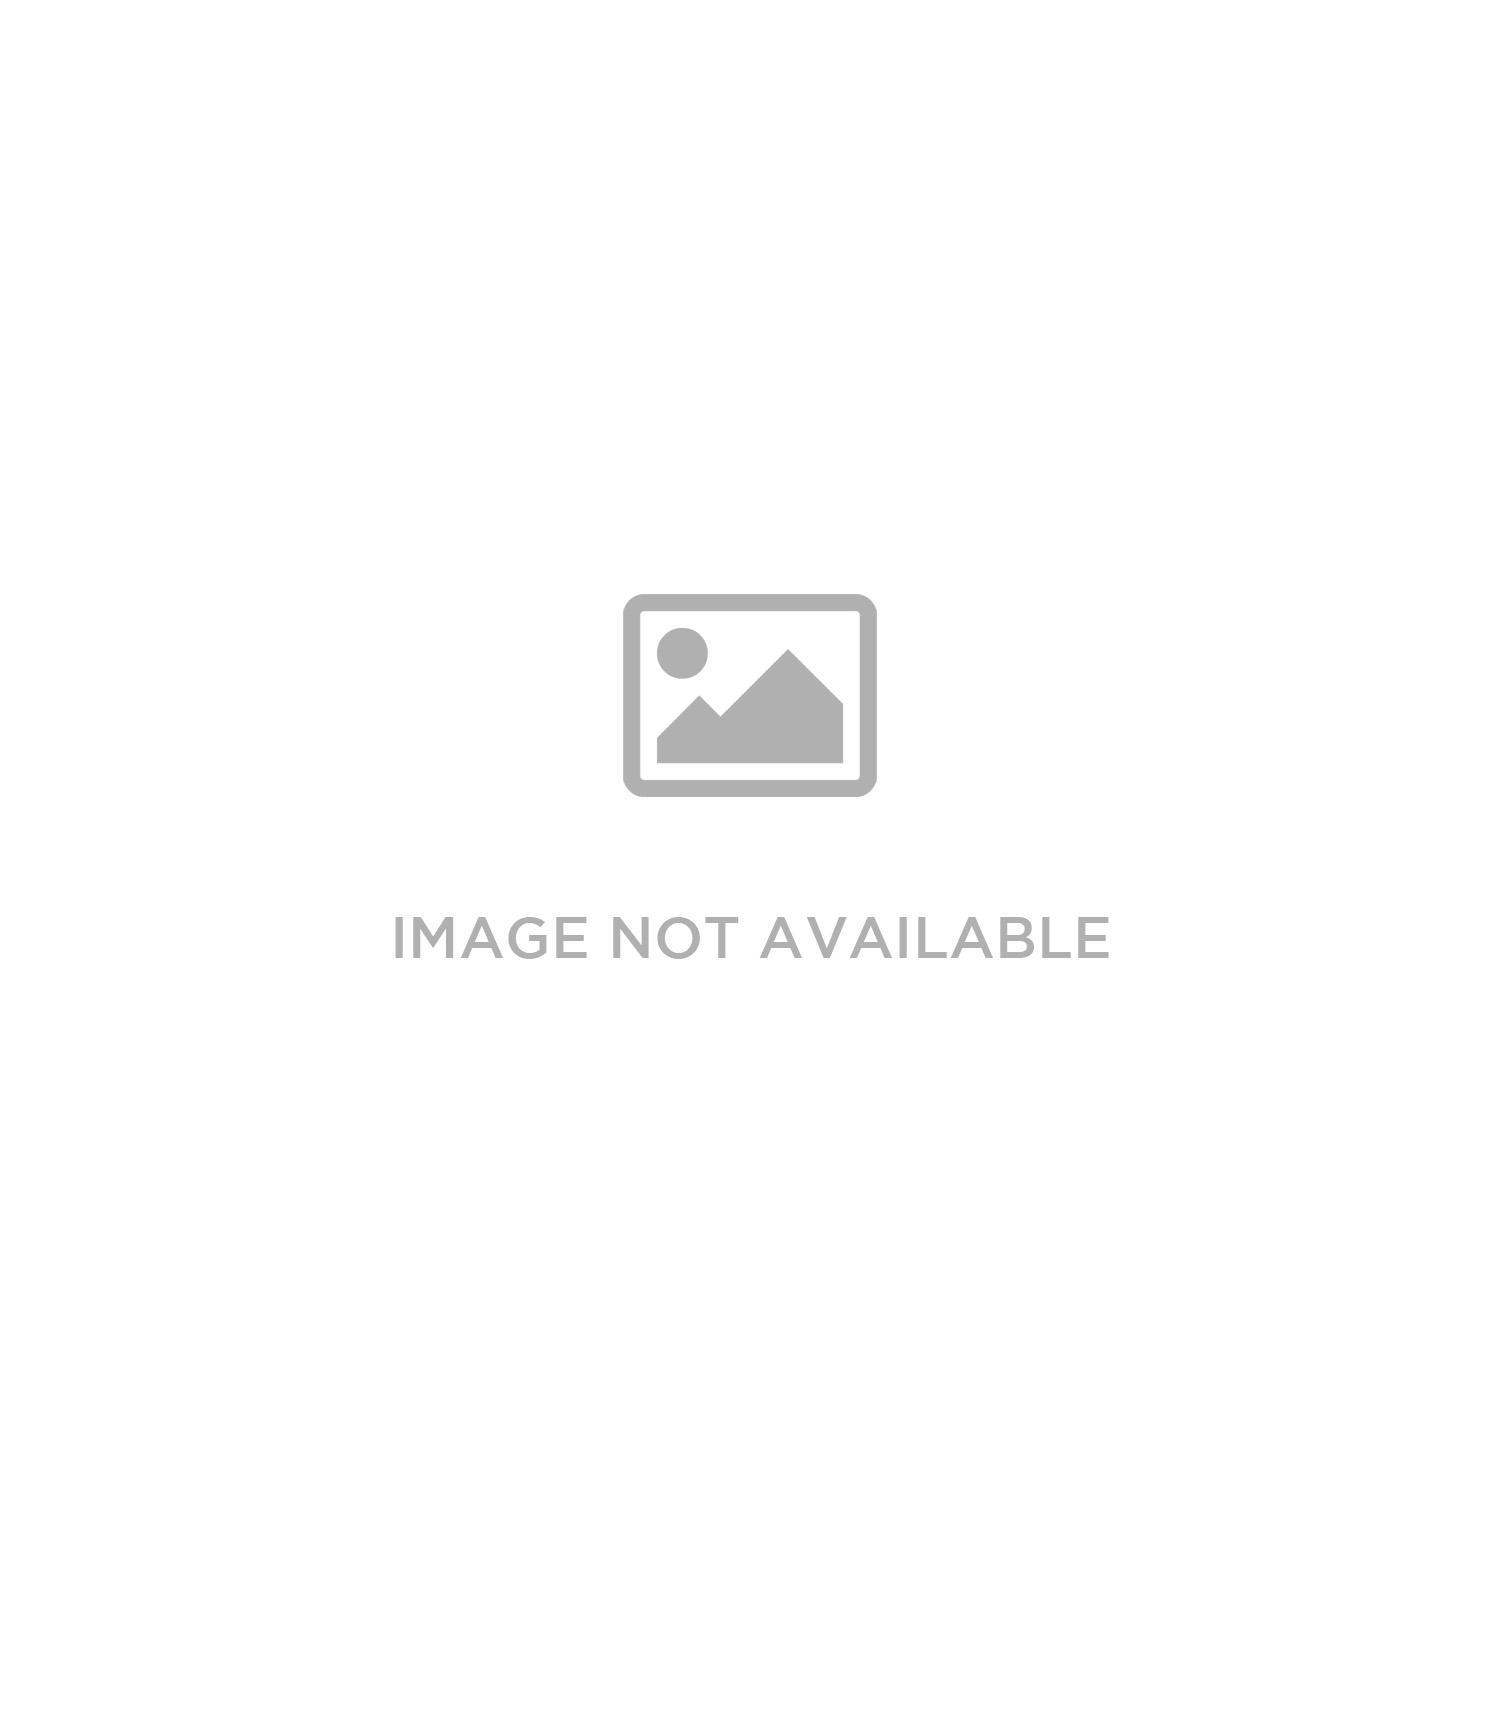 FRUIT OF THE LOOM®; HEAVY COTTON HD™ LONG SLEEVE T-SHIRT. 4930R